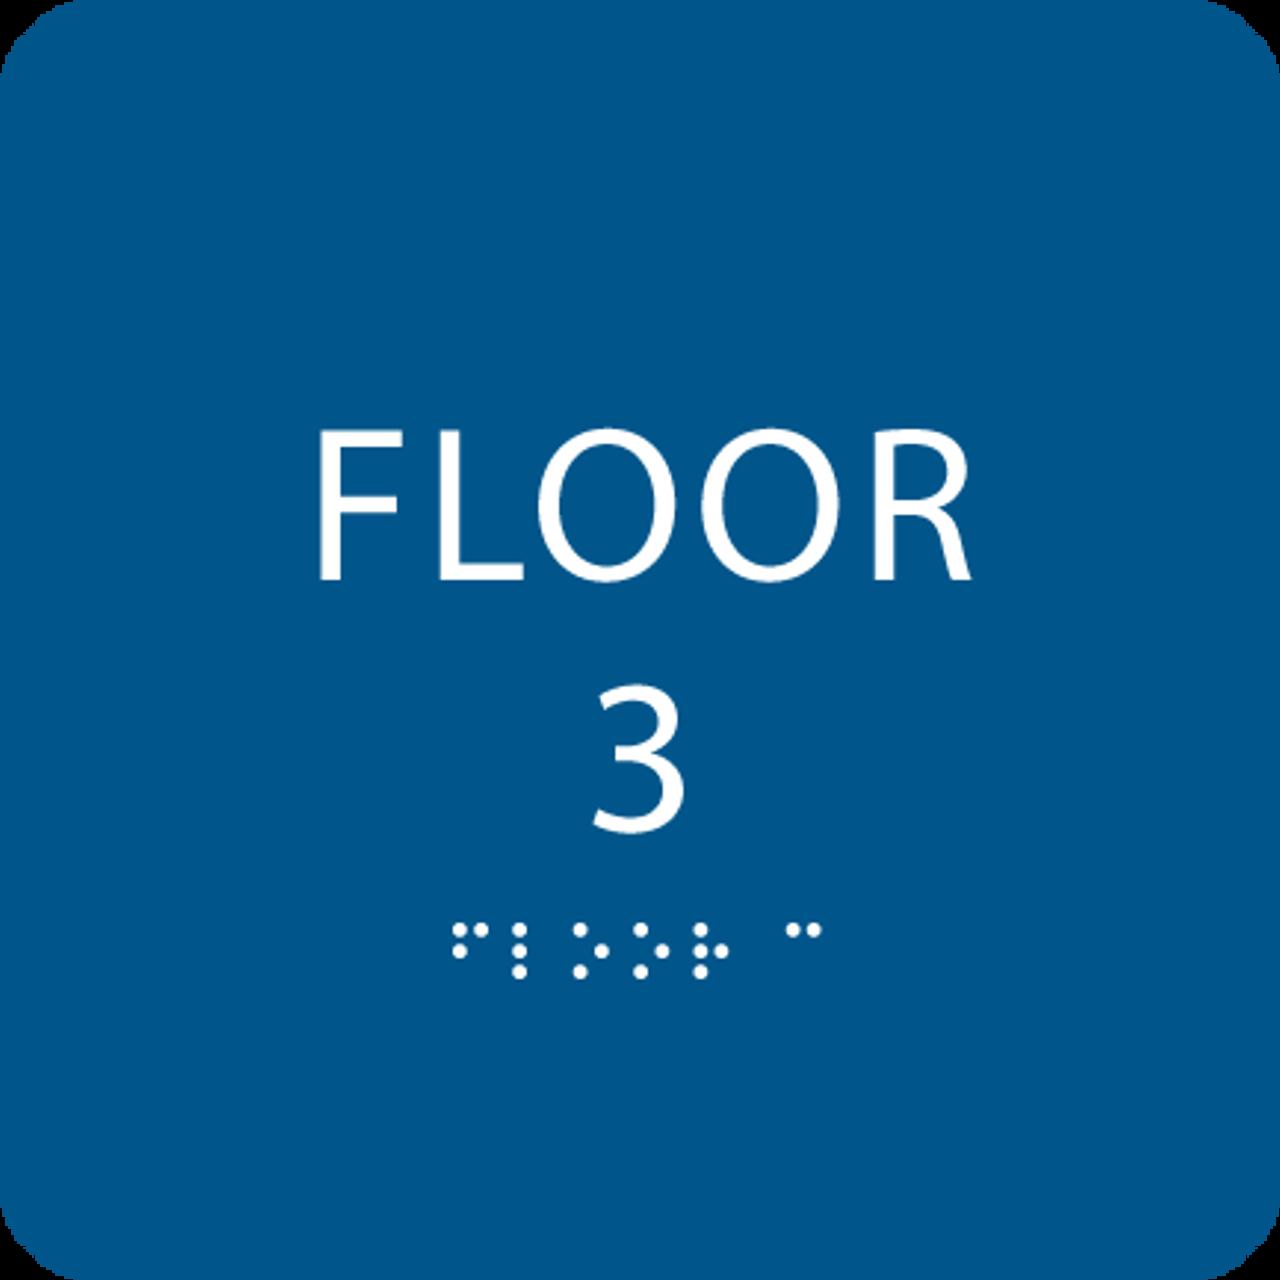 Royal Blue Floor 3 Identification Sign